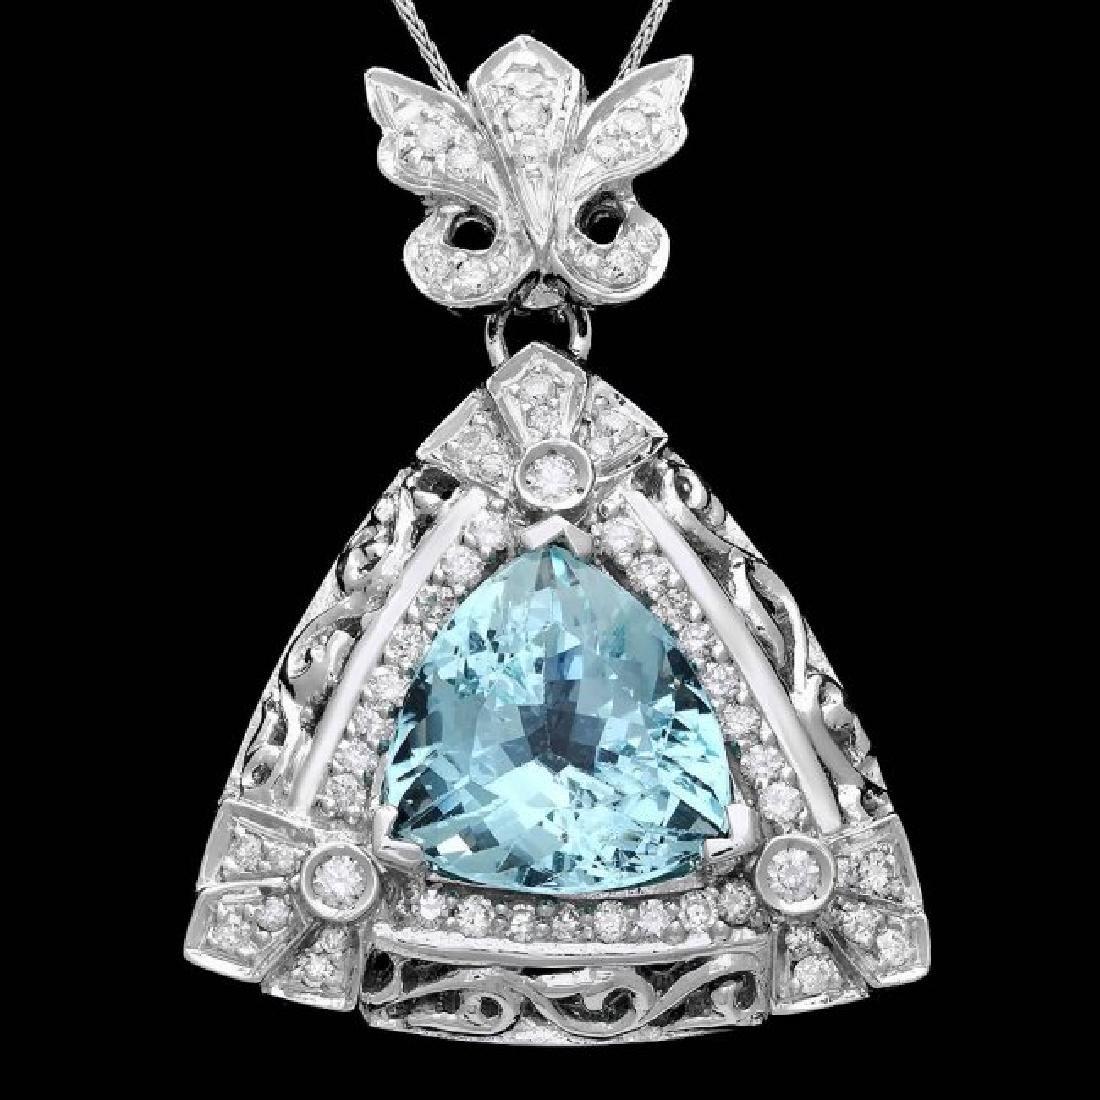 14k W Gold 10ct Aquamarine 1.35ct Diamond Pendant